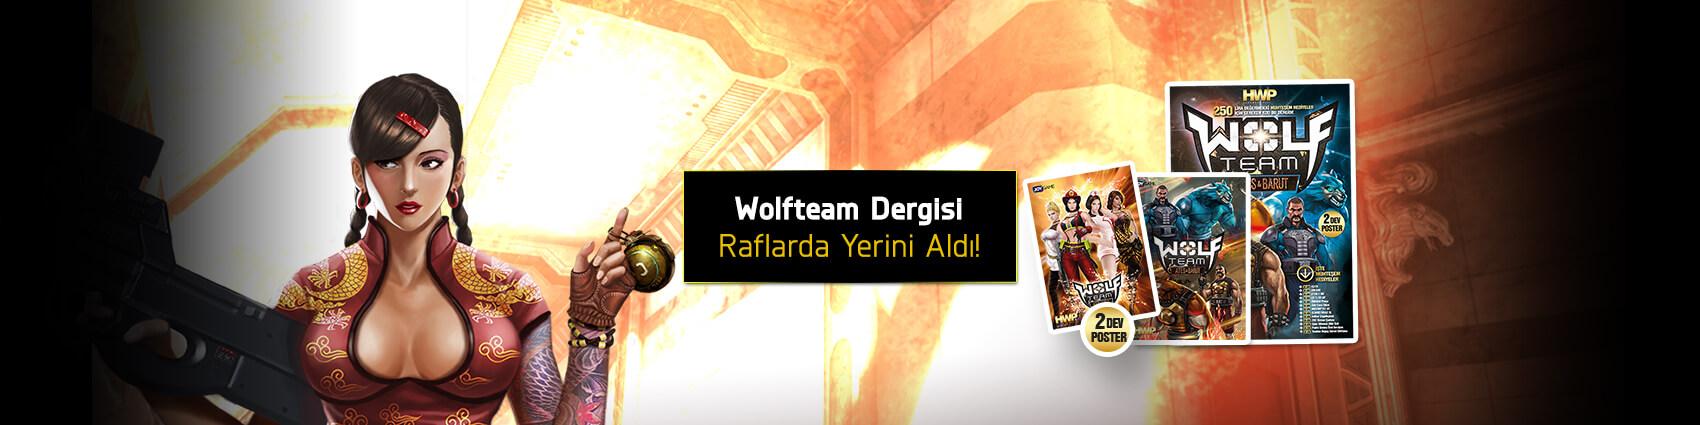 Wolfteam Dergisi Bayilerde